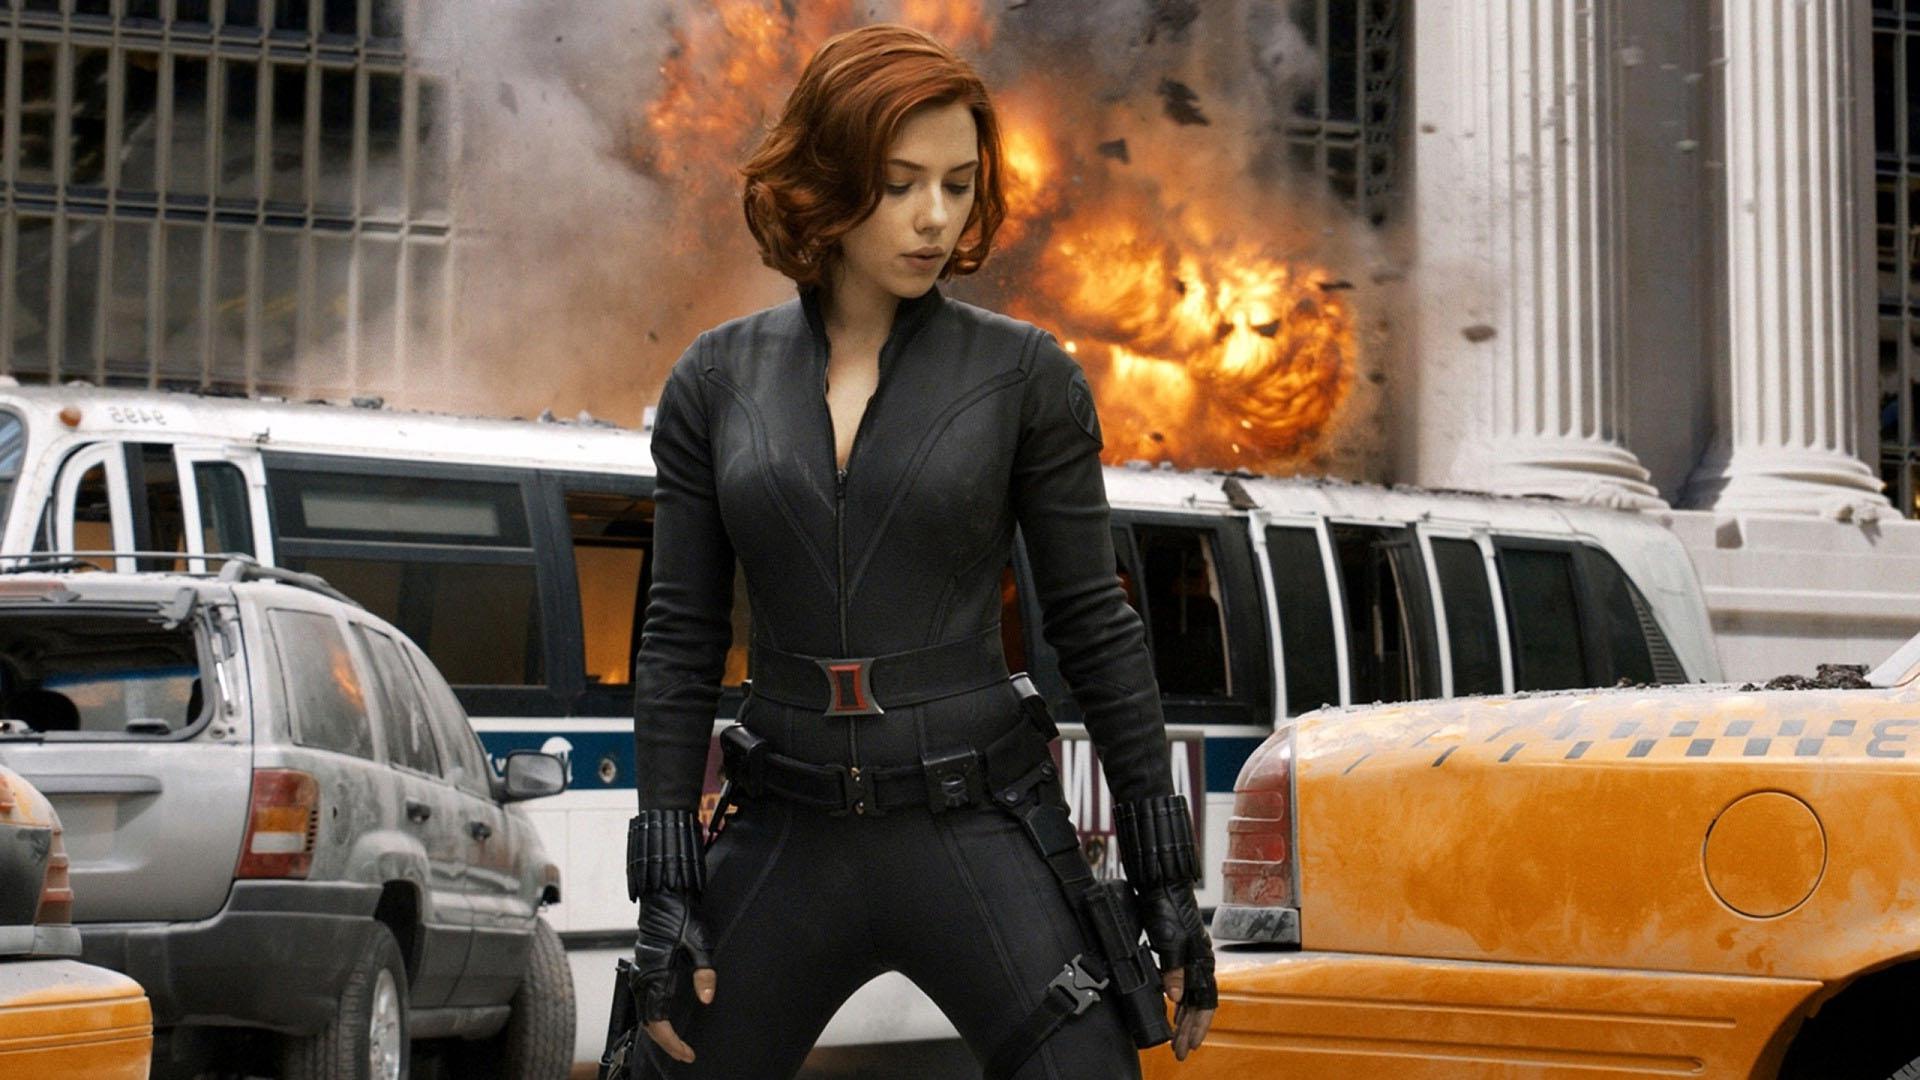 Ruda superbohaterka komiksu Marvela w czarnym kostiumie.